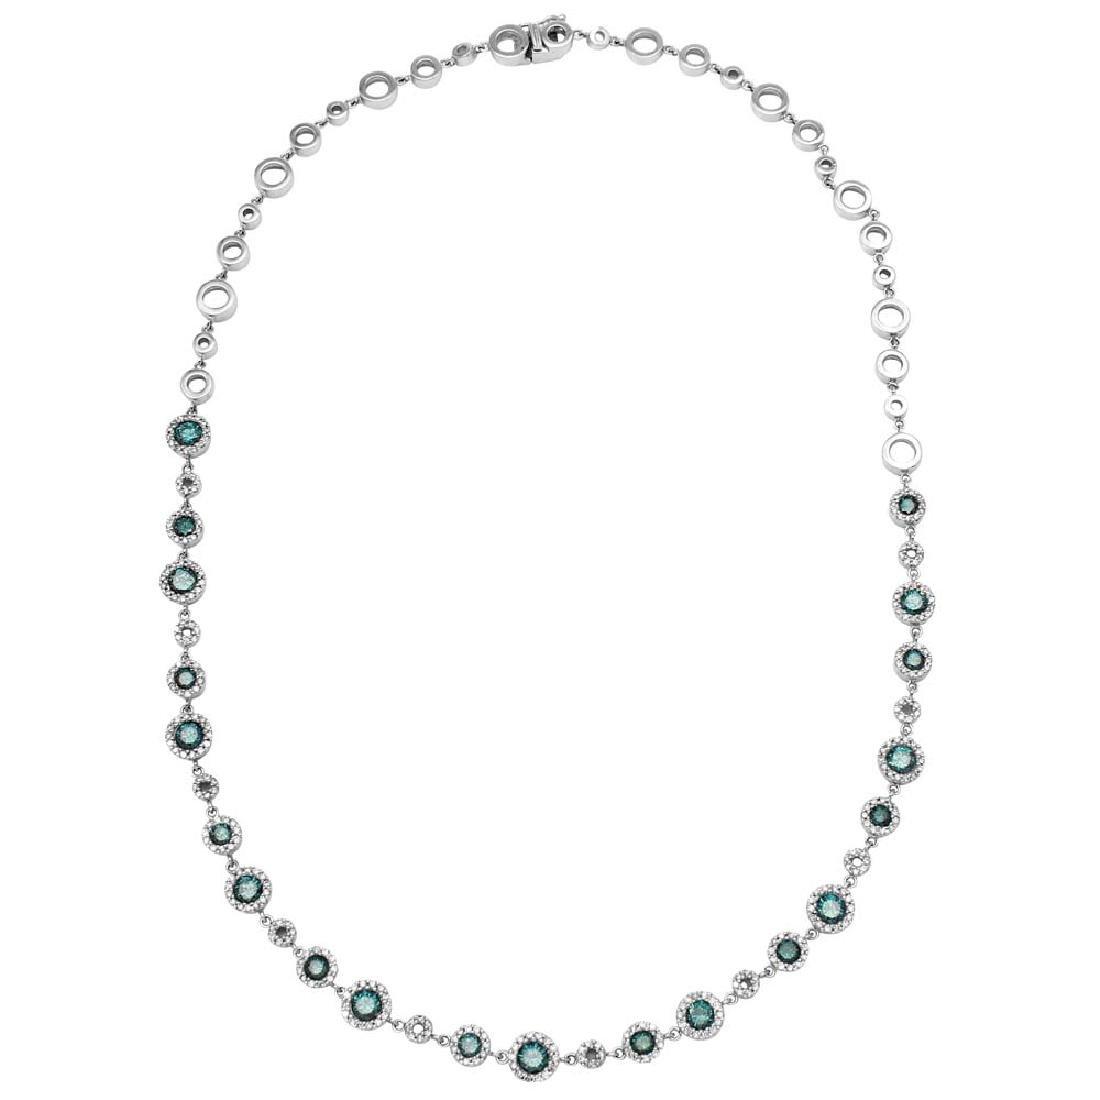 Genuine 1.29 TCW 18K White Gold Ladies Necklace